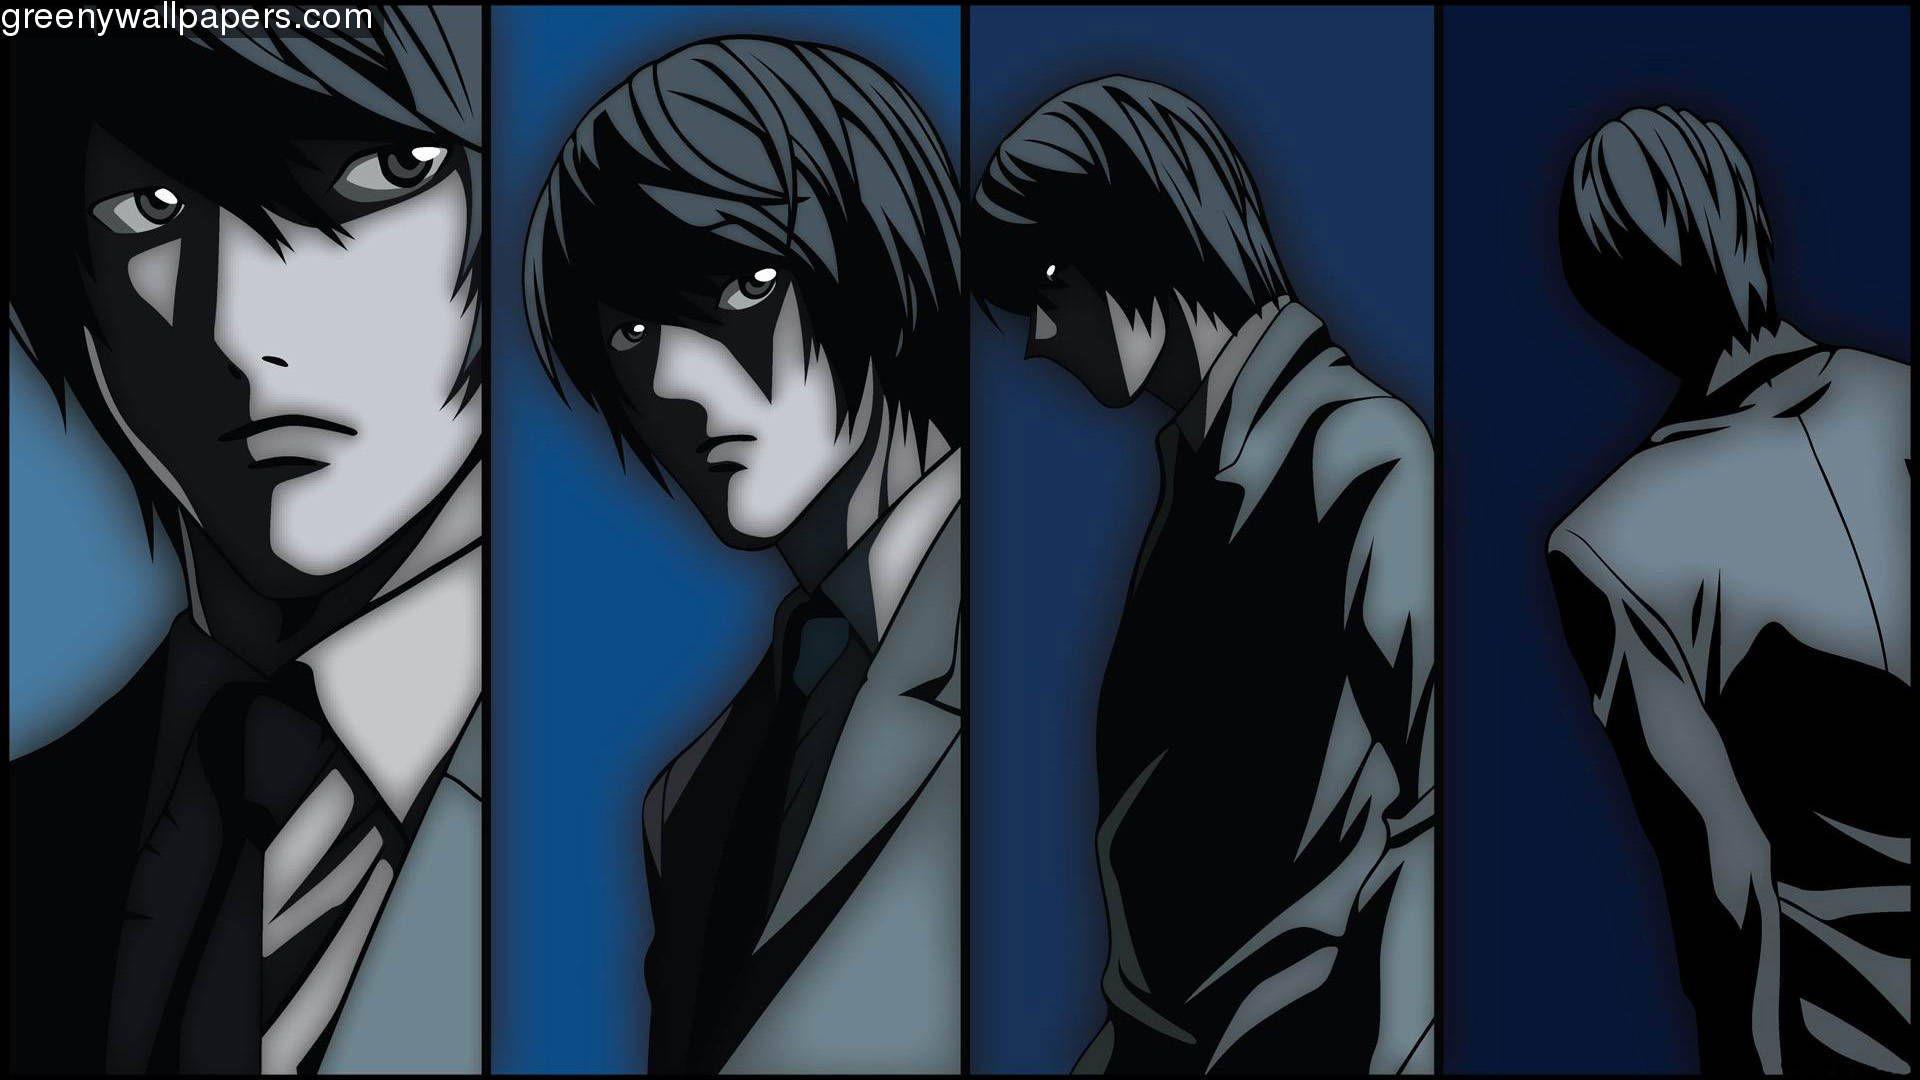 Light Yagami Wallpaper 1024 768 Light Yagami Wallpapers 52 Wallpapers Adorable Wallpapers Death Note Death Note Kira Death Note Fanart